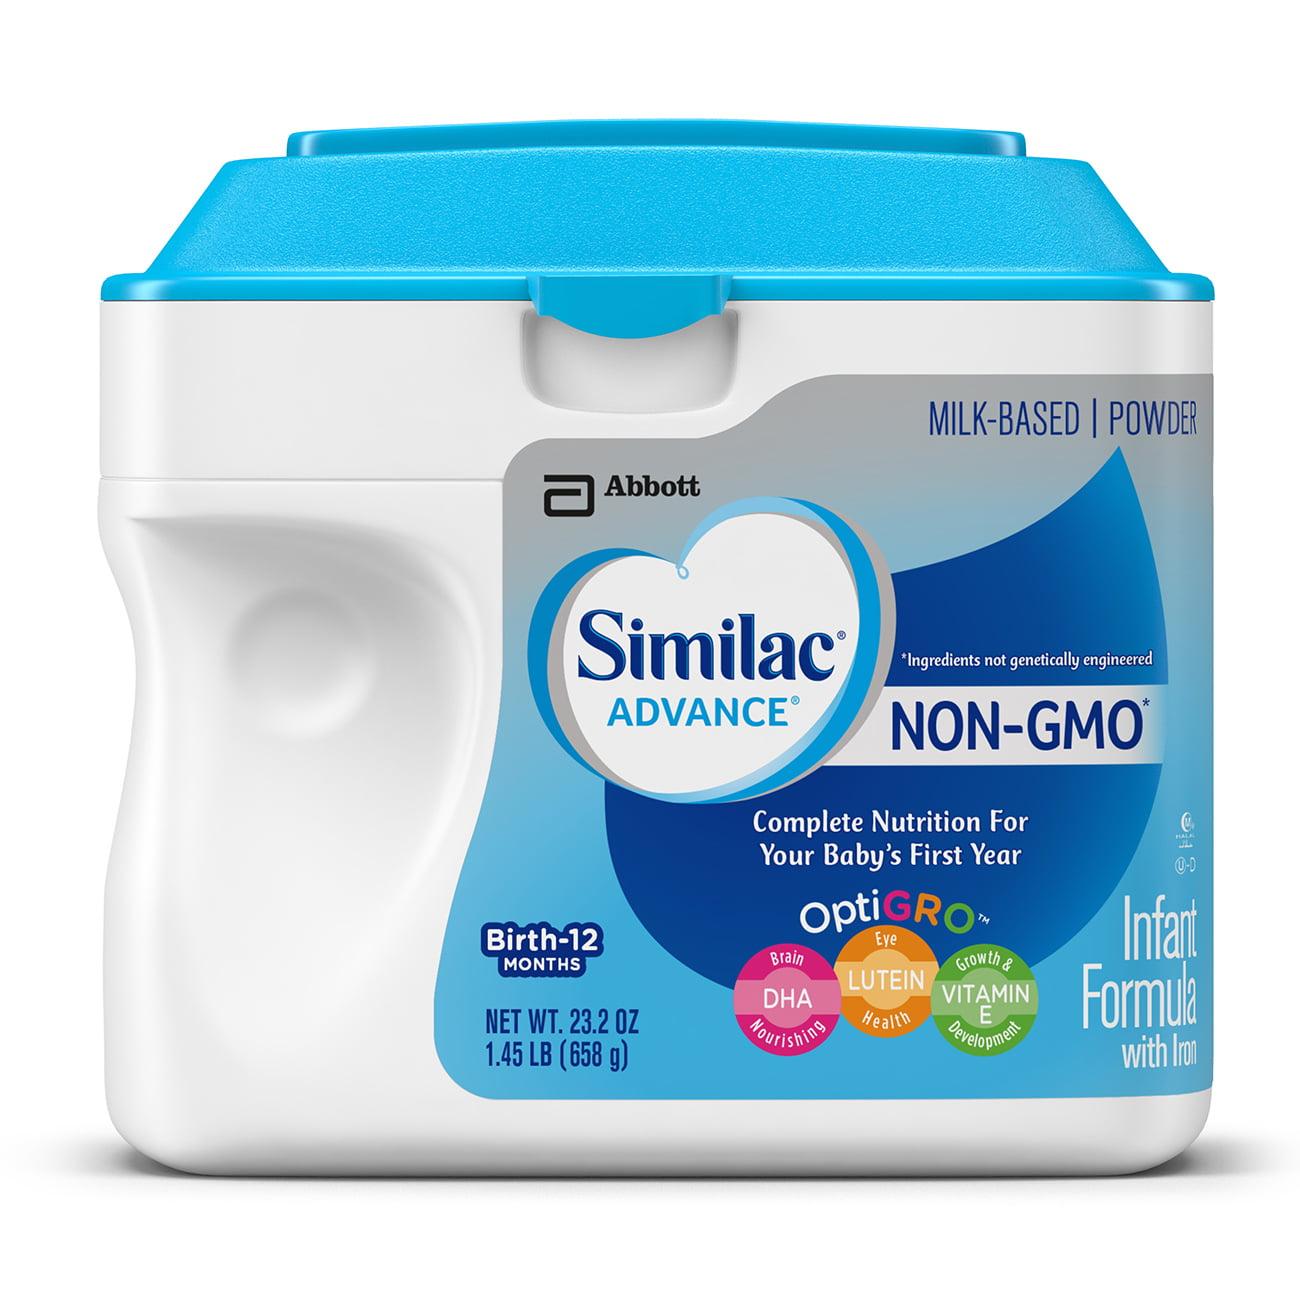 Similac Advance NON-GMO Infant Formula with Iron, Powder, 1.45 lb